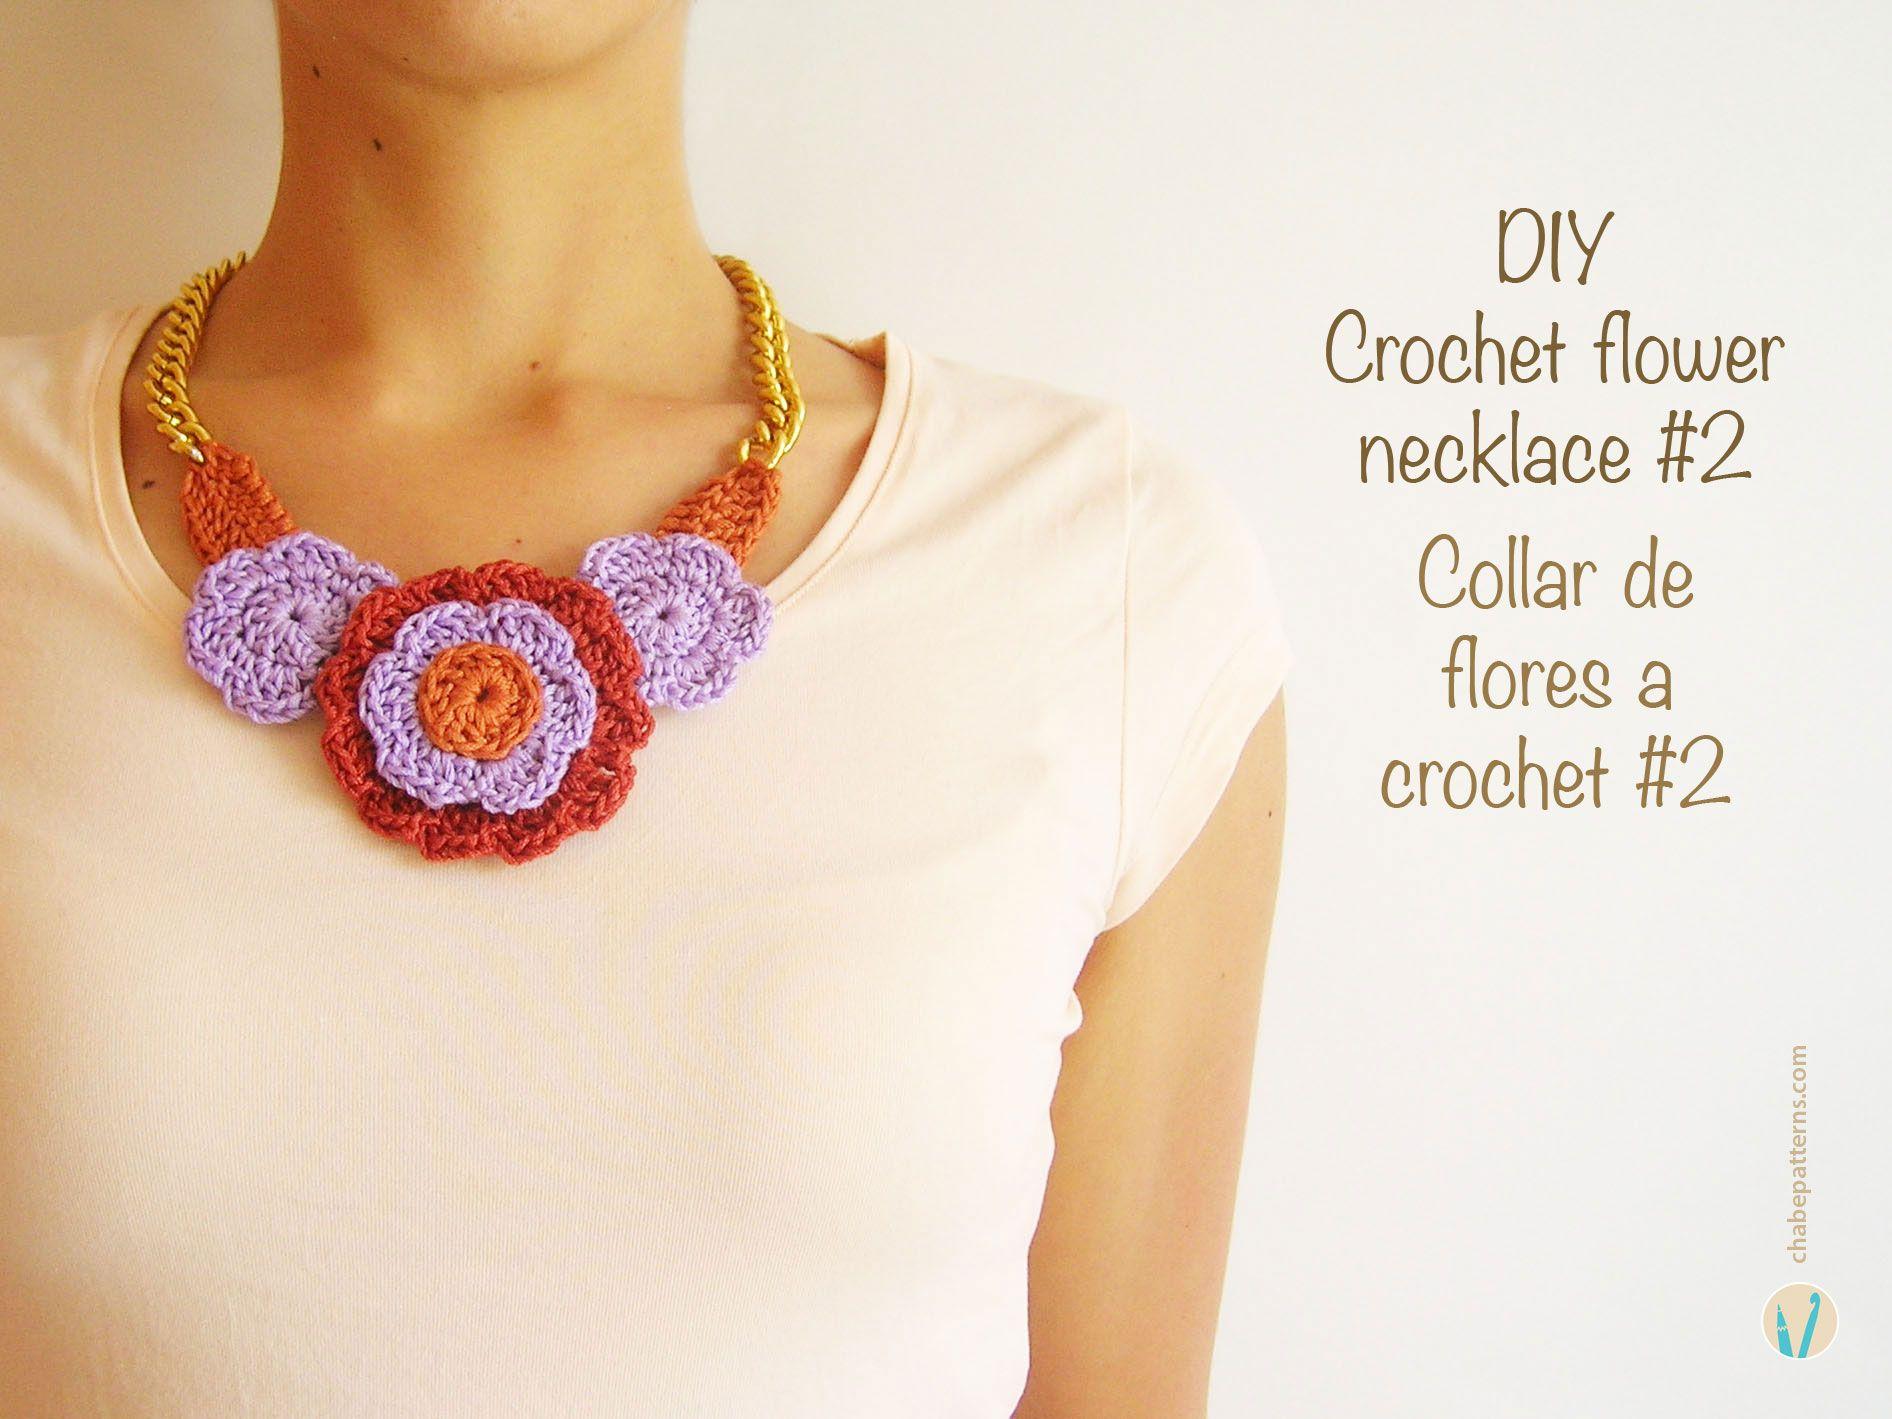 DIY crochet flower necklace #2, free pattern, easy beautiful layers ...